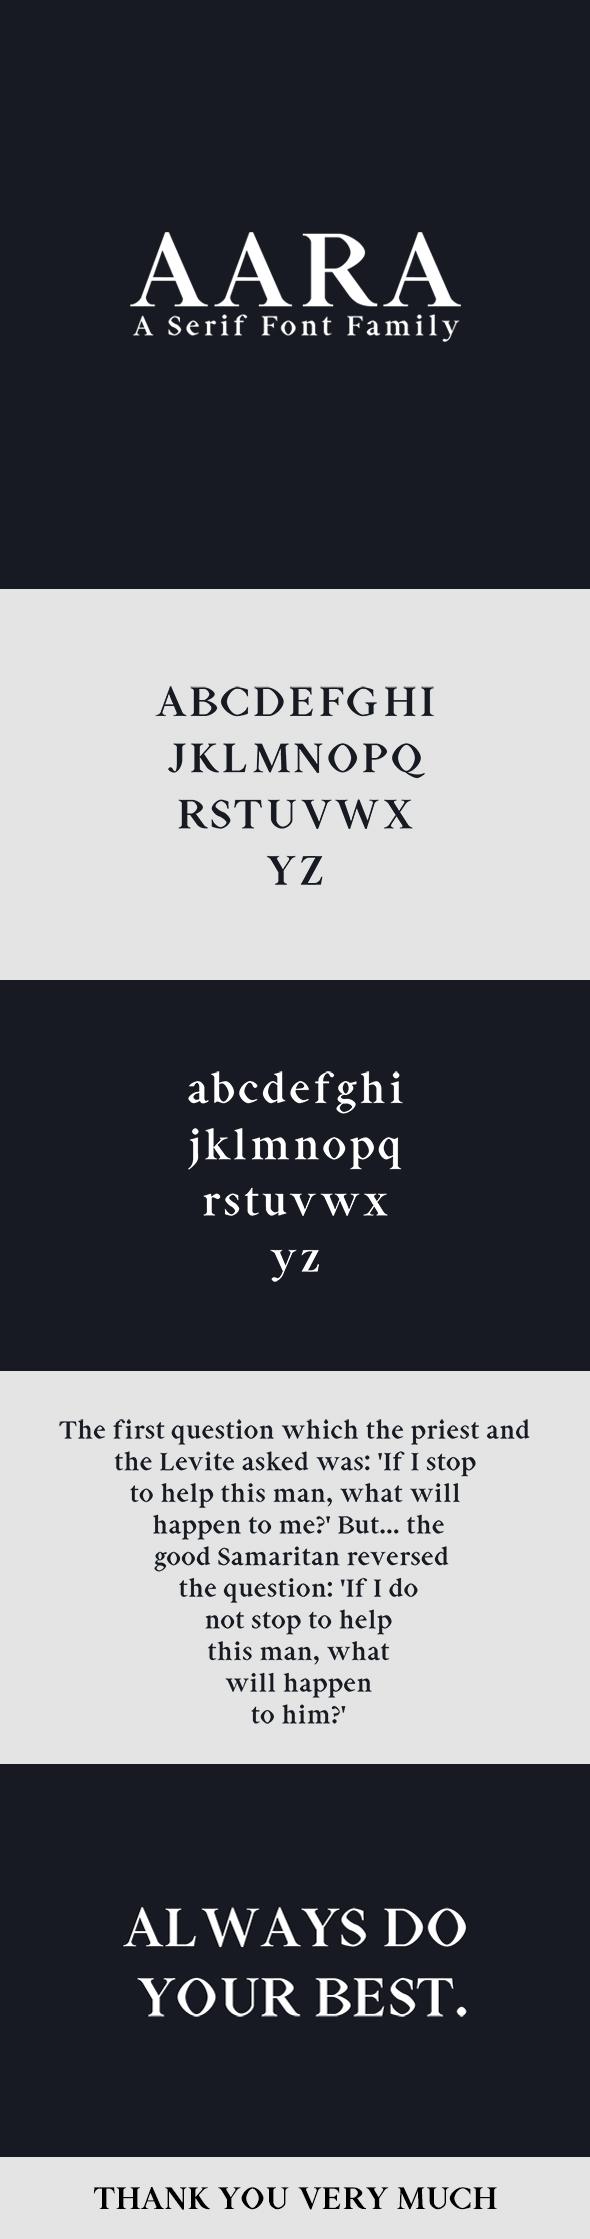 Free Font Aara Serif Font Family Download